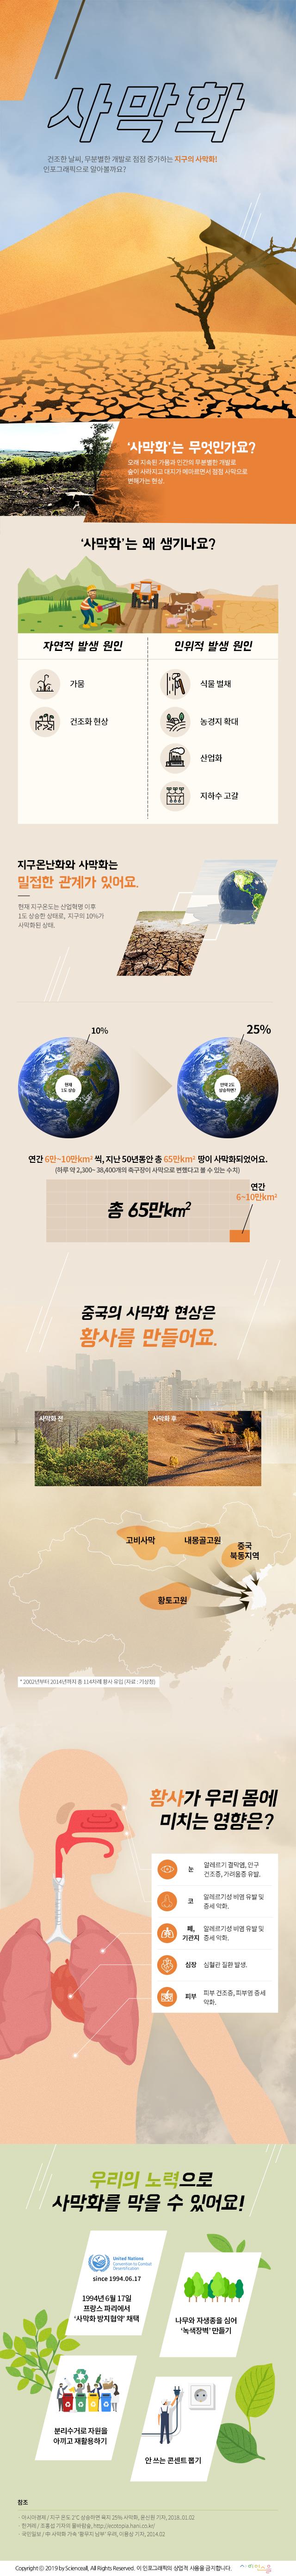 infographic_50호_사막화-web(190618)_